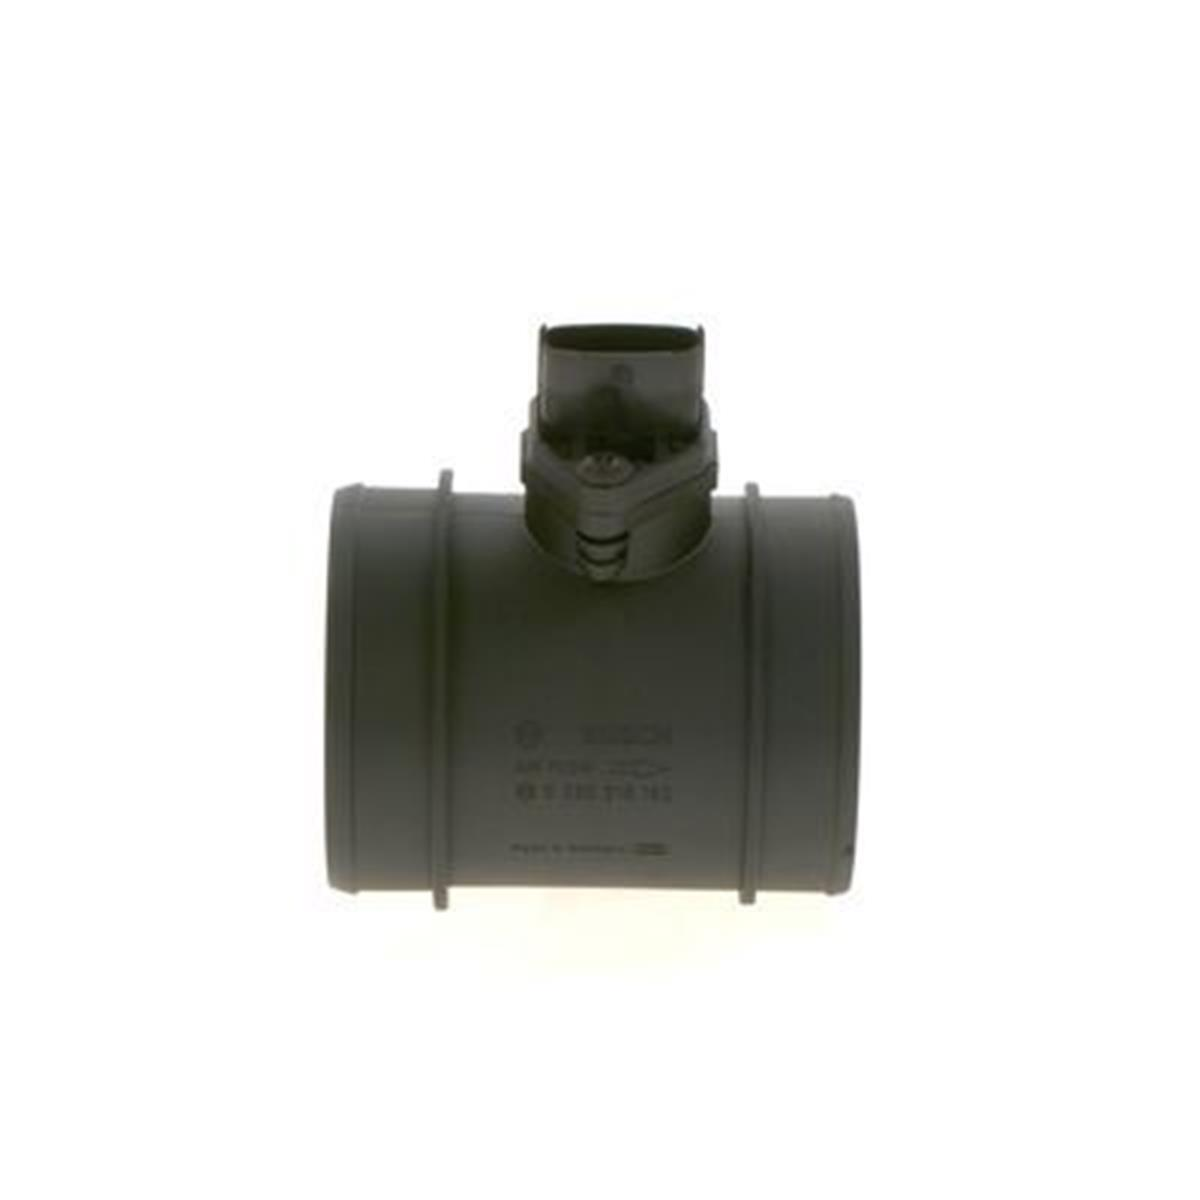 Faltenbalg Gummimanschette Staubschutz Kardanwelle MASERATI Biturbo Modelle